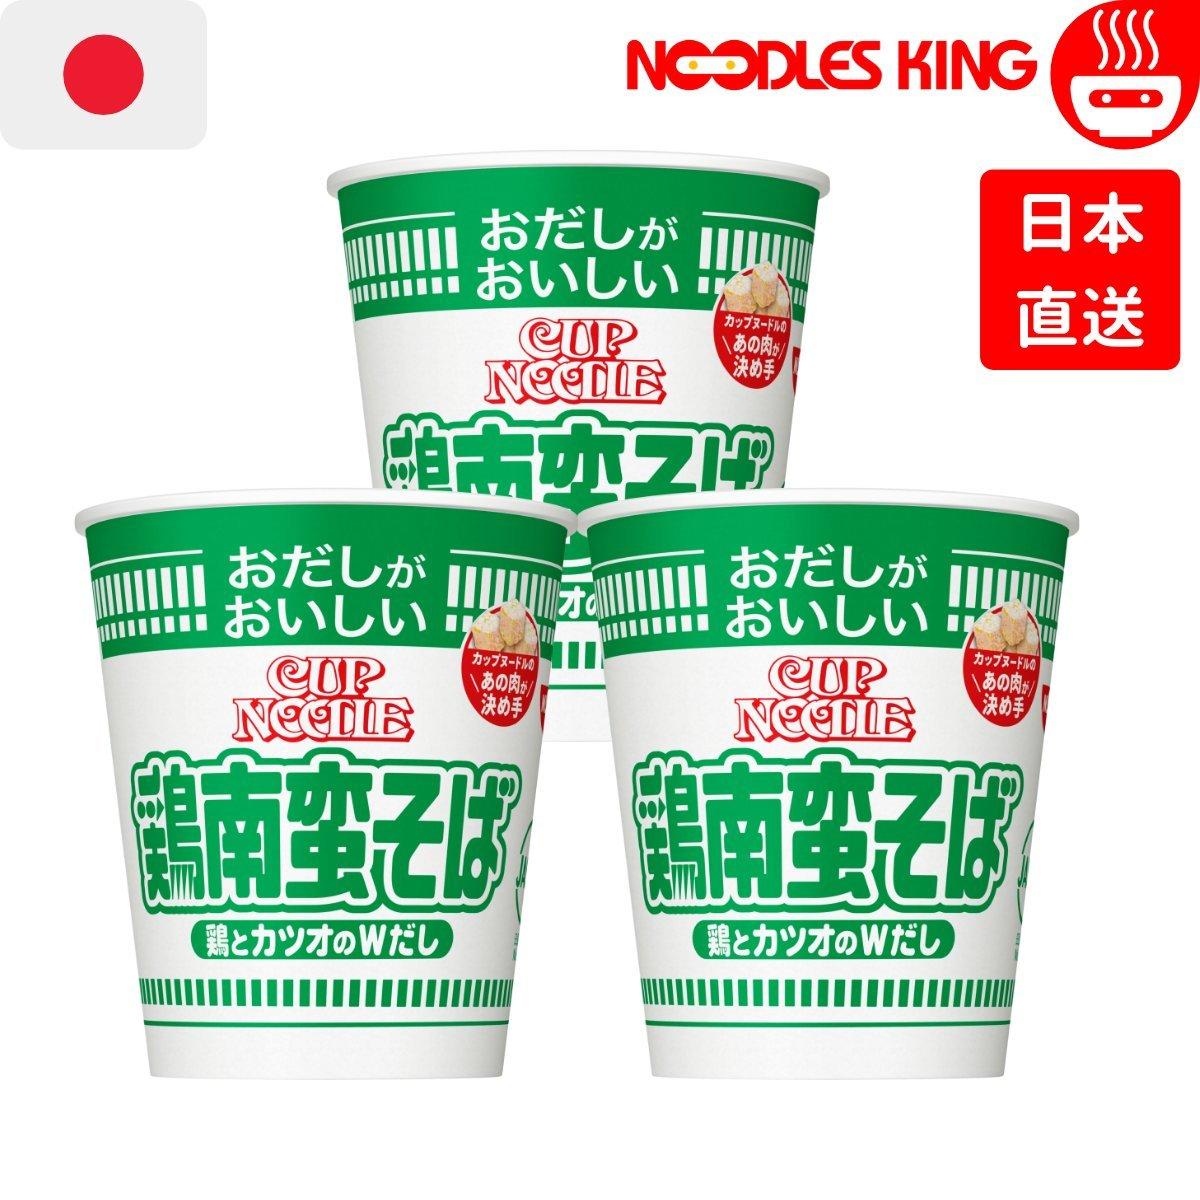 Cup Noodles Soba - Chicken Flavour (Japan) 62g x 3